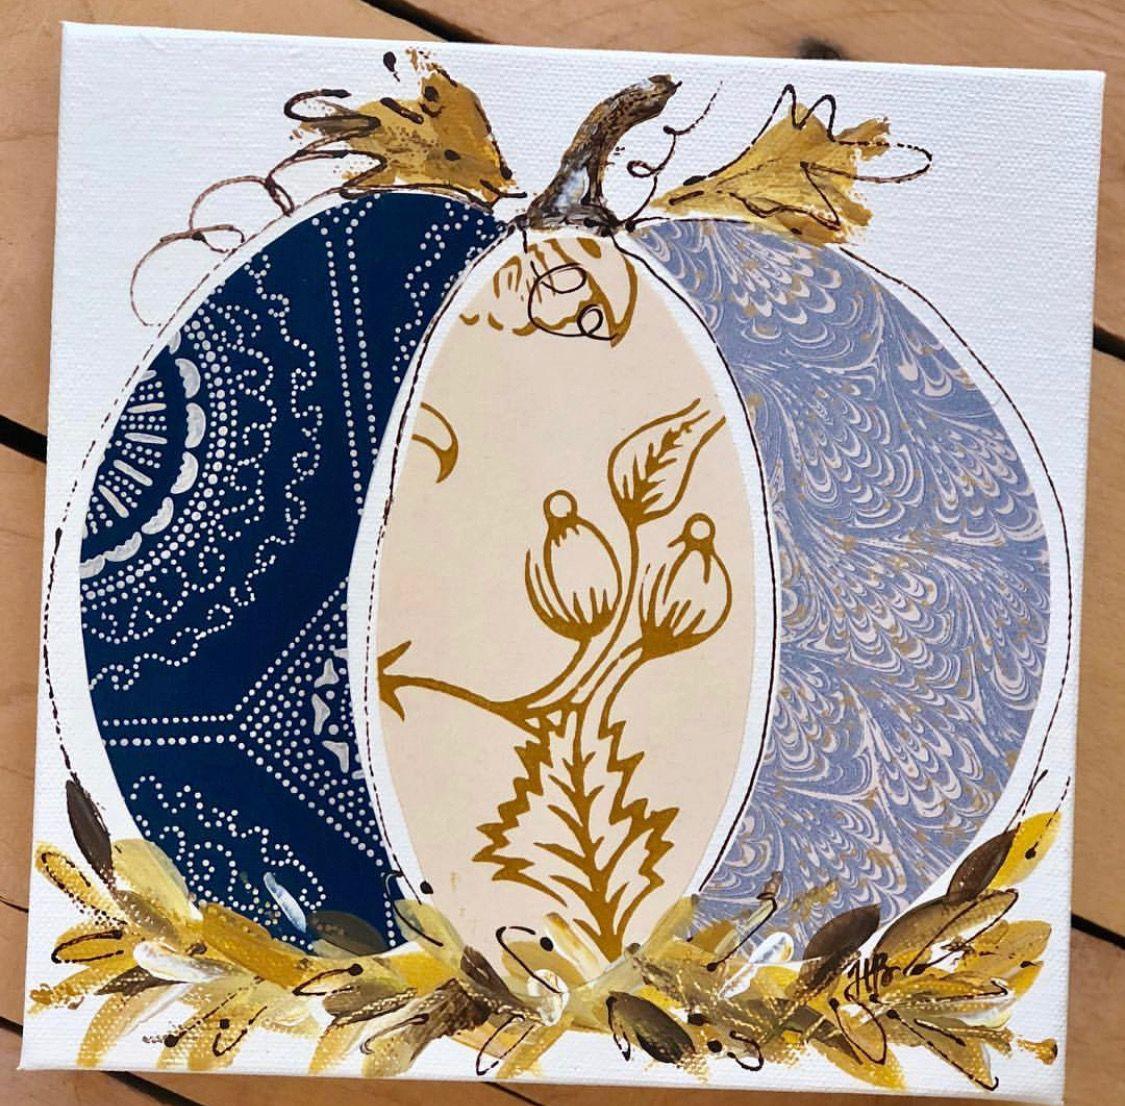 Pin by Kelly Acker on CraftsDecoupage/Mod Podge Fall